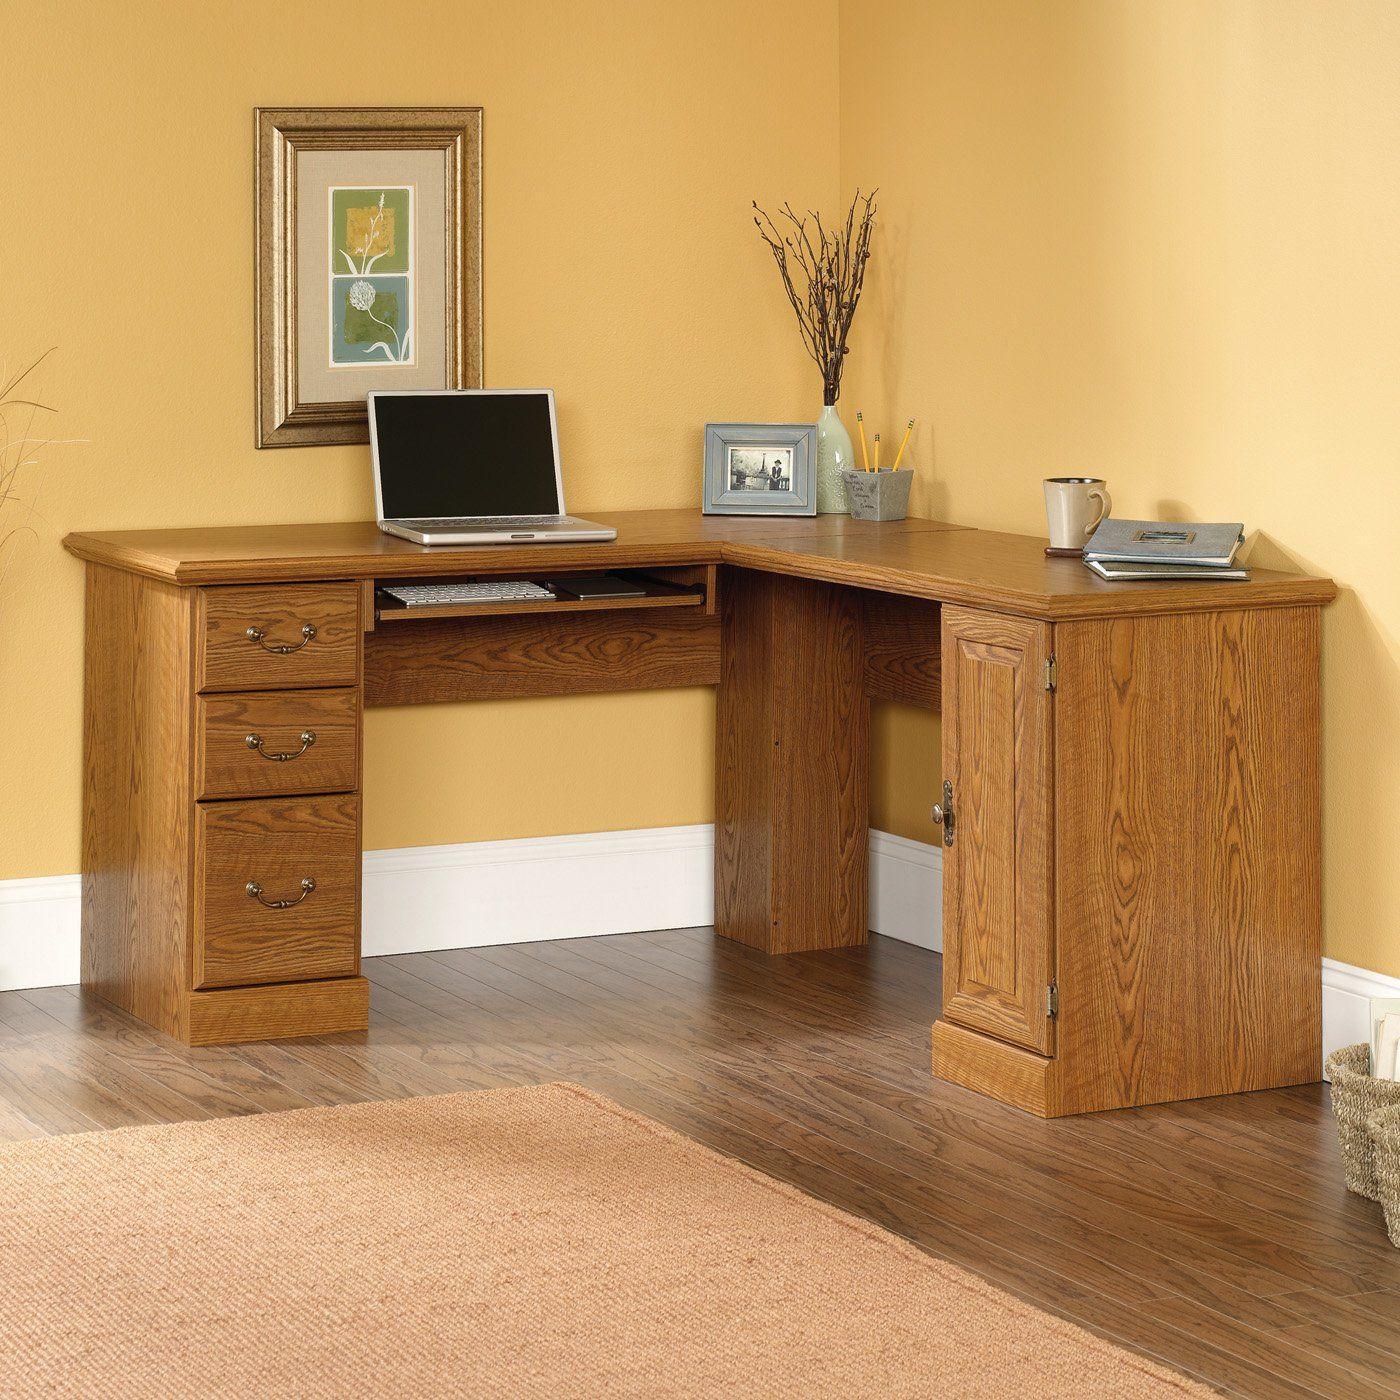 home office corner desk furniture. Oak Corner Desks For Home Office - Furniture Set Check More At Http: Desk B